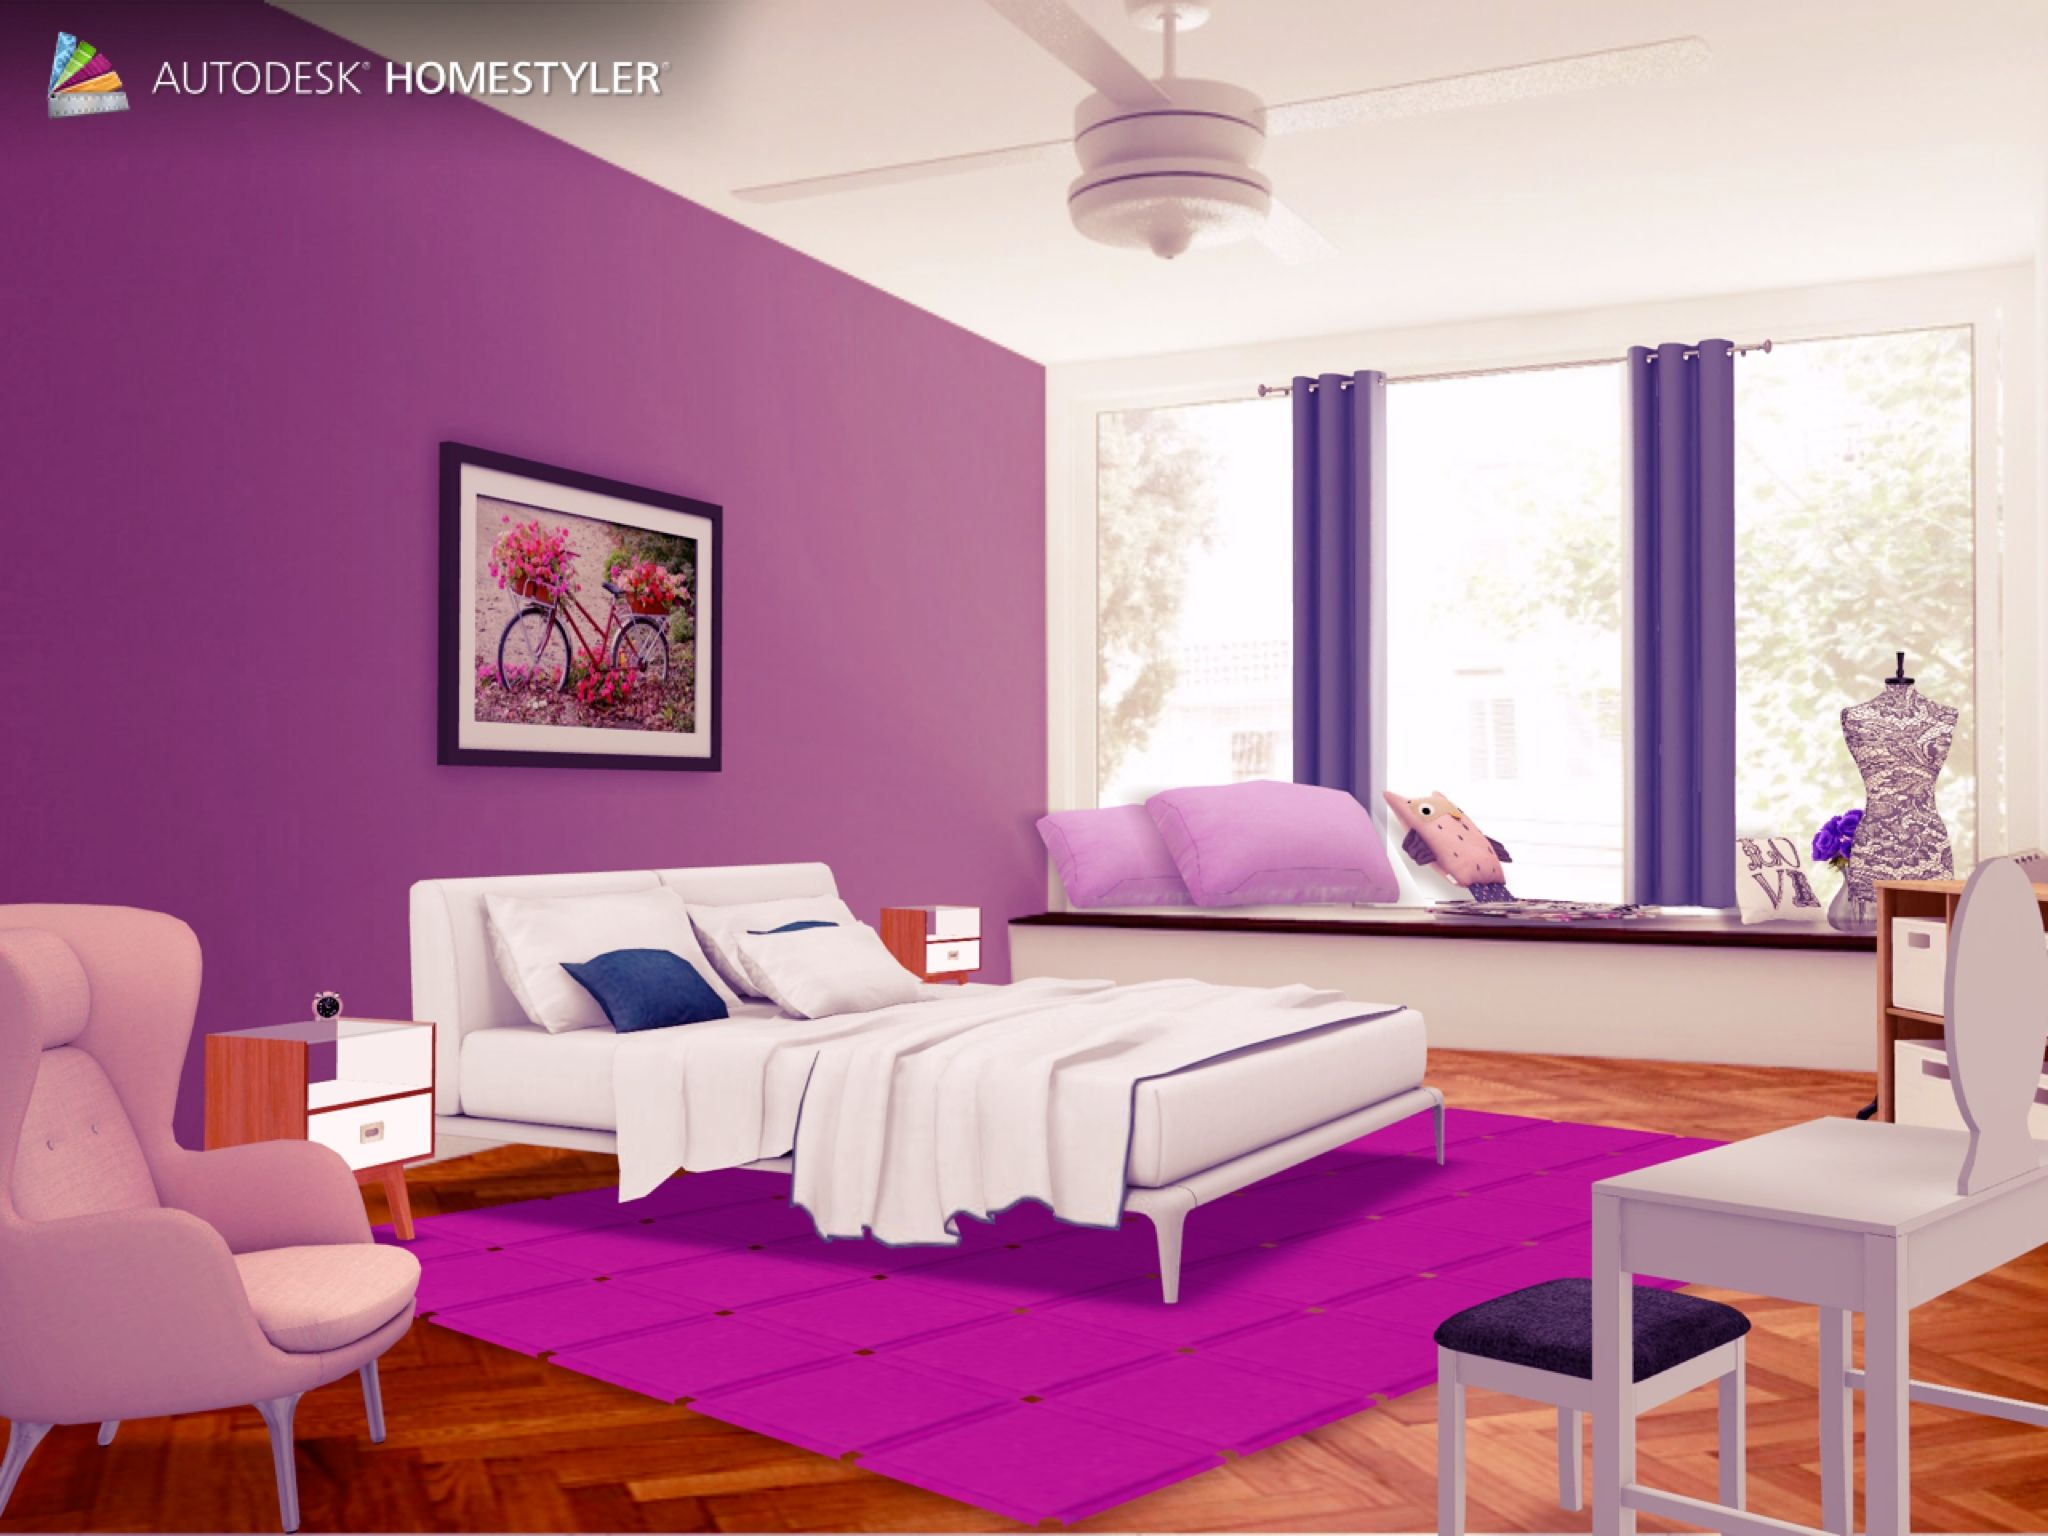 "Eche un vistazo a mi #diseño interior ""Rooms dream "" de #Homestyler http://autode.sk/1pxEoqv"